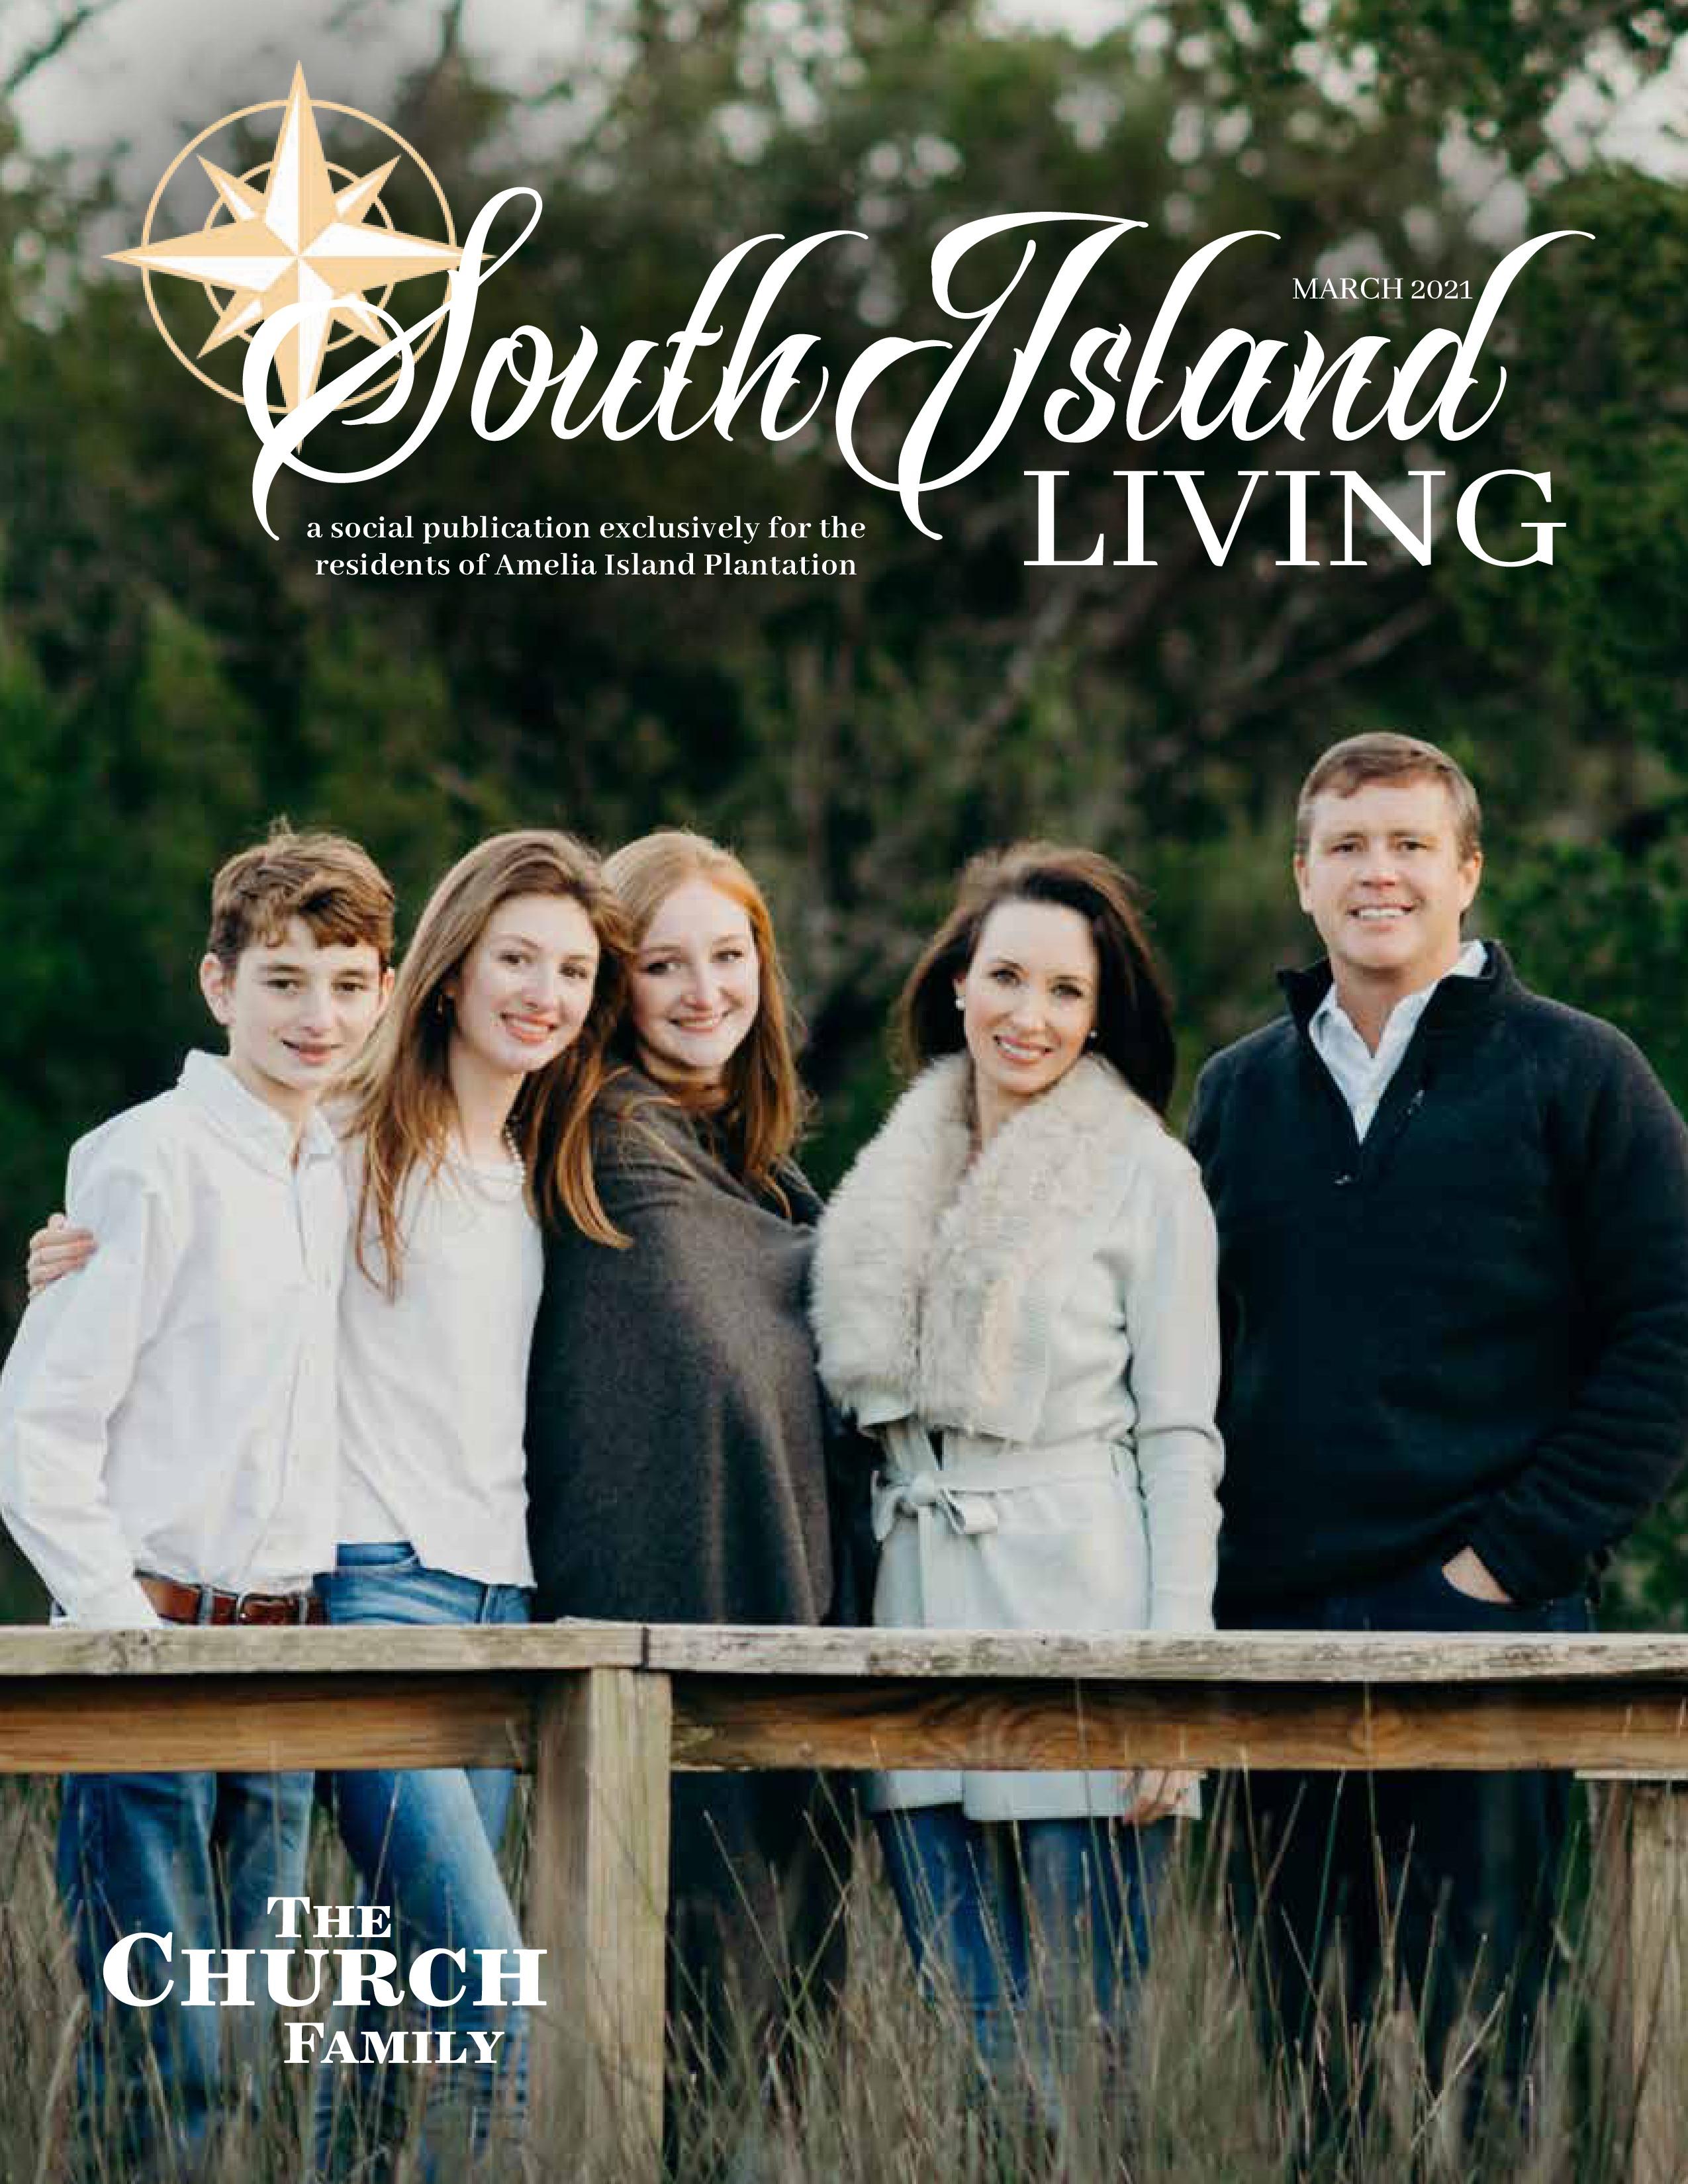 South Island Living 2021-03-01